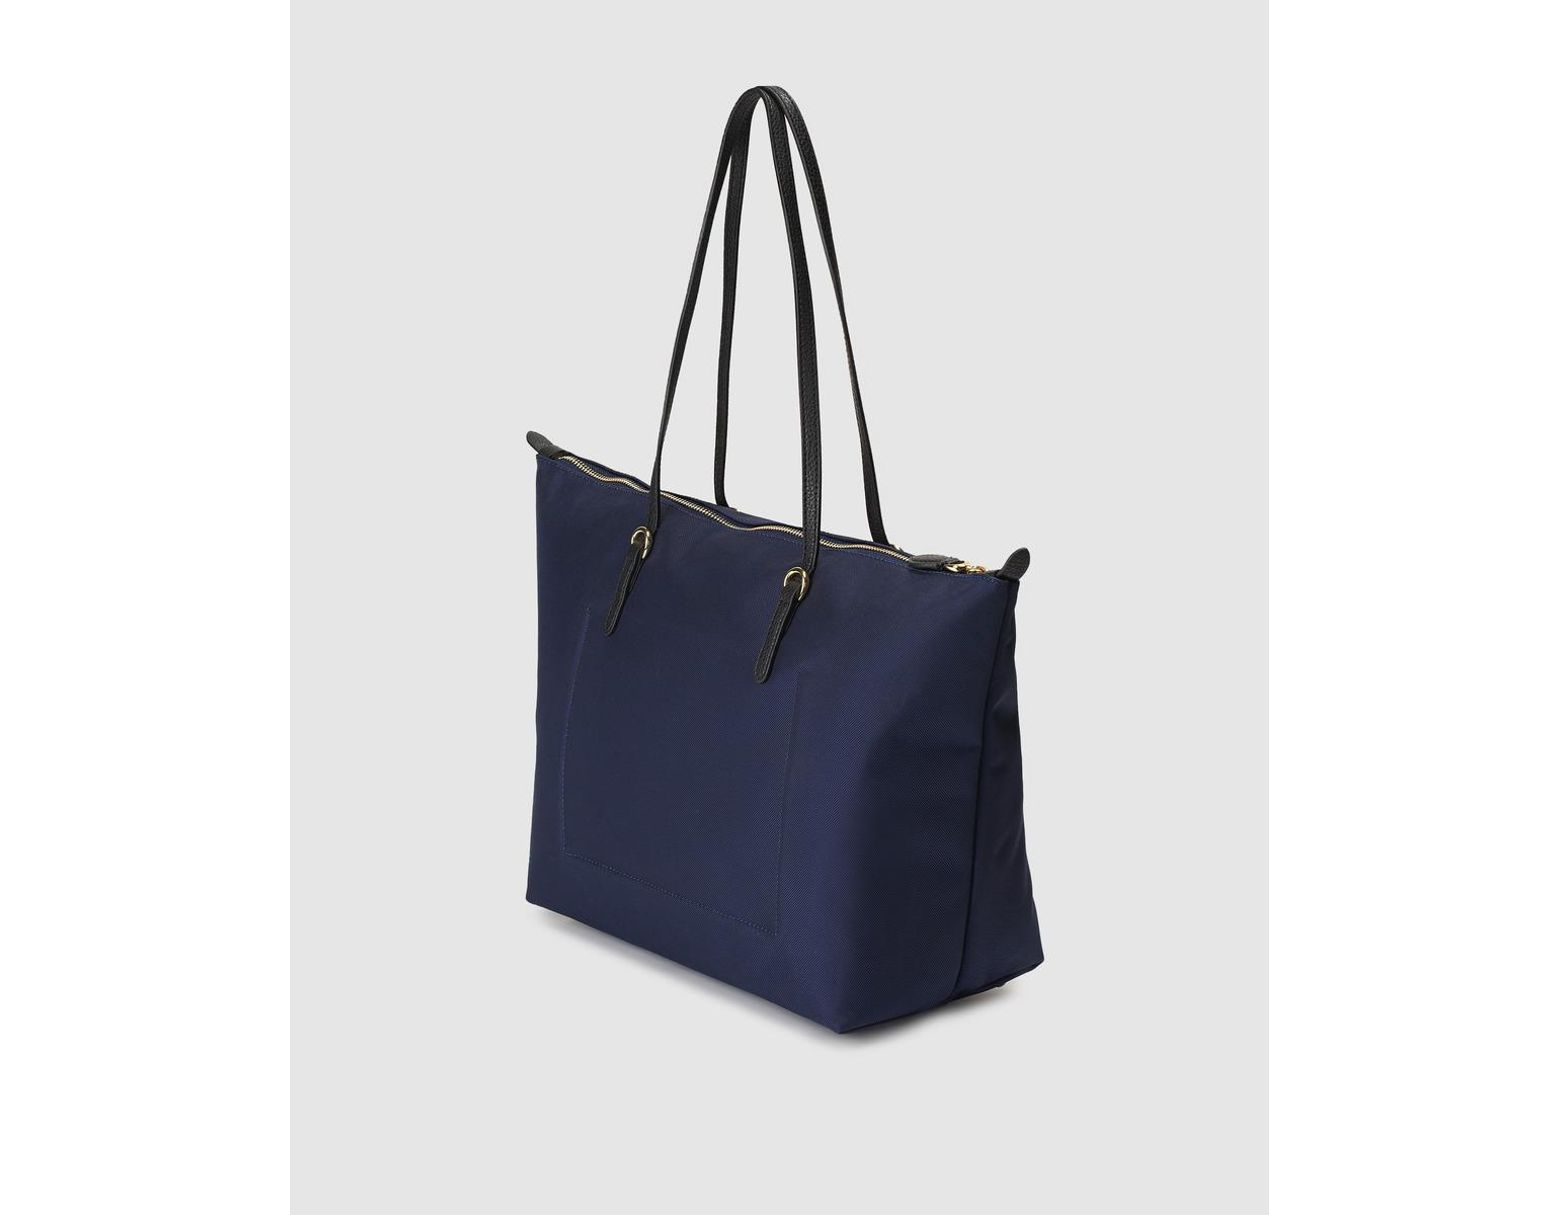 fb7e9e3a0 Lauren by Ralph Lauren Navy Blue Nylon Tote Bag With Zip in Blue - Lyst